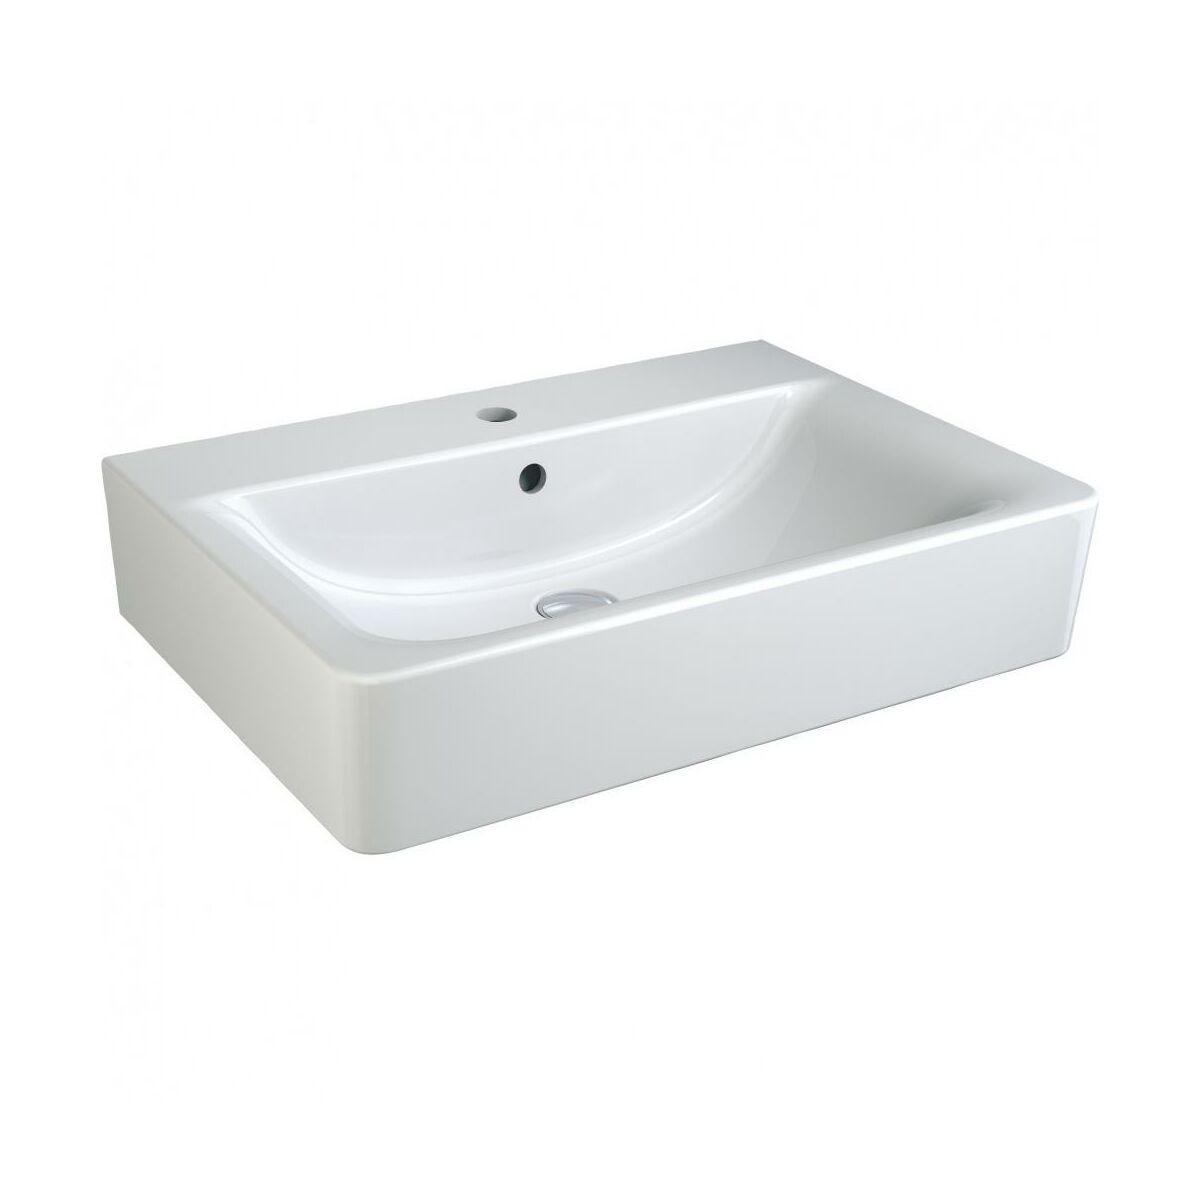 umywalka connect umywalki w atrakcyjnej cenie w. Black Bedroom Furniture Sets. Home Design Ideas